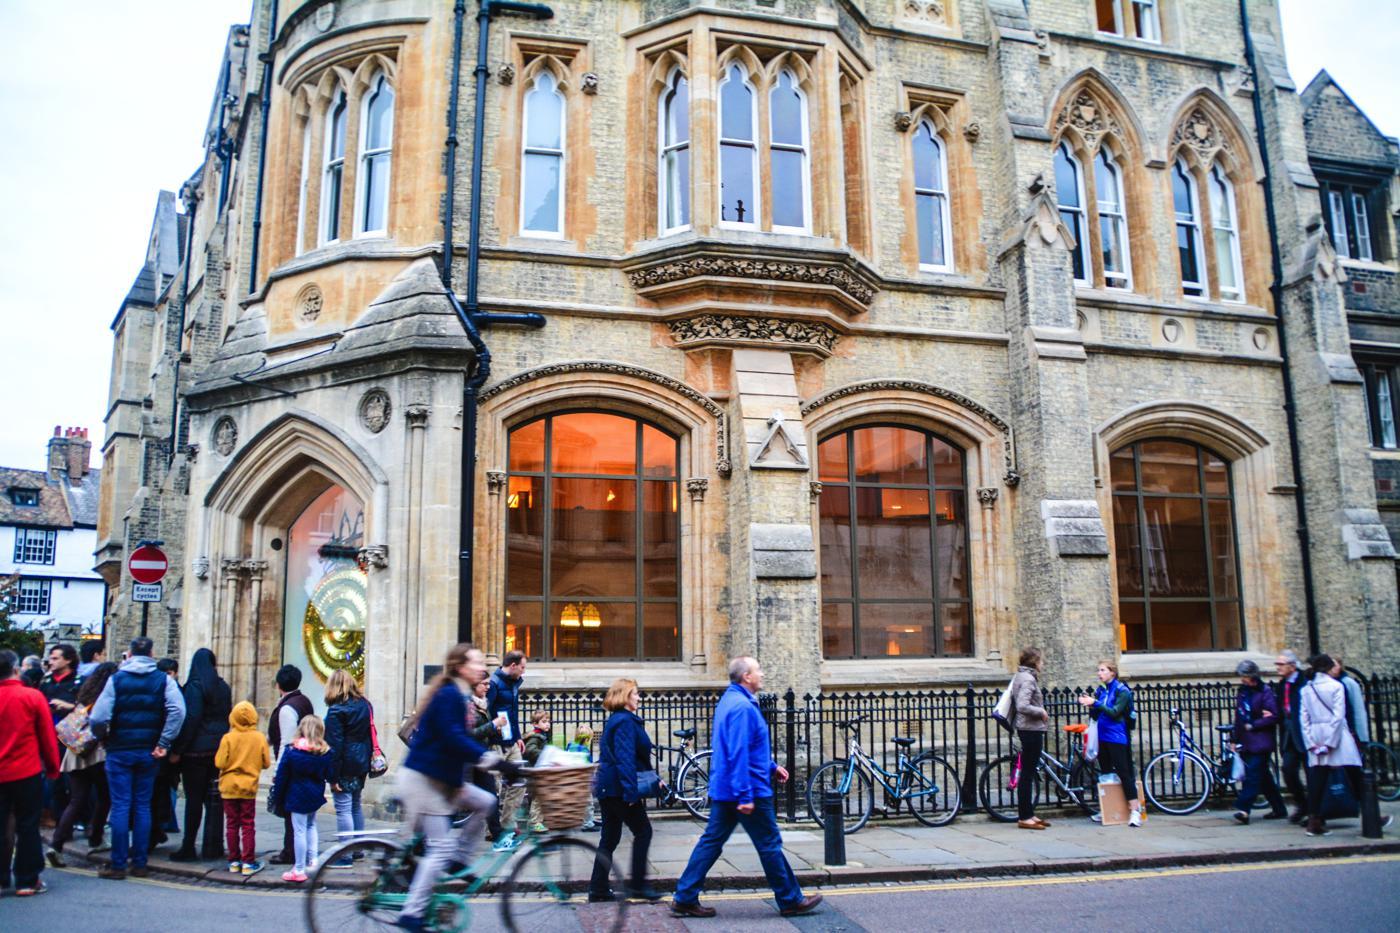 The University of Cambridge, Graduation, Senate House, Cambridge, England (8)